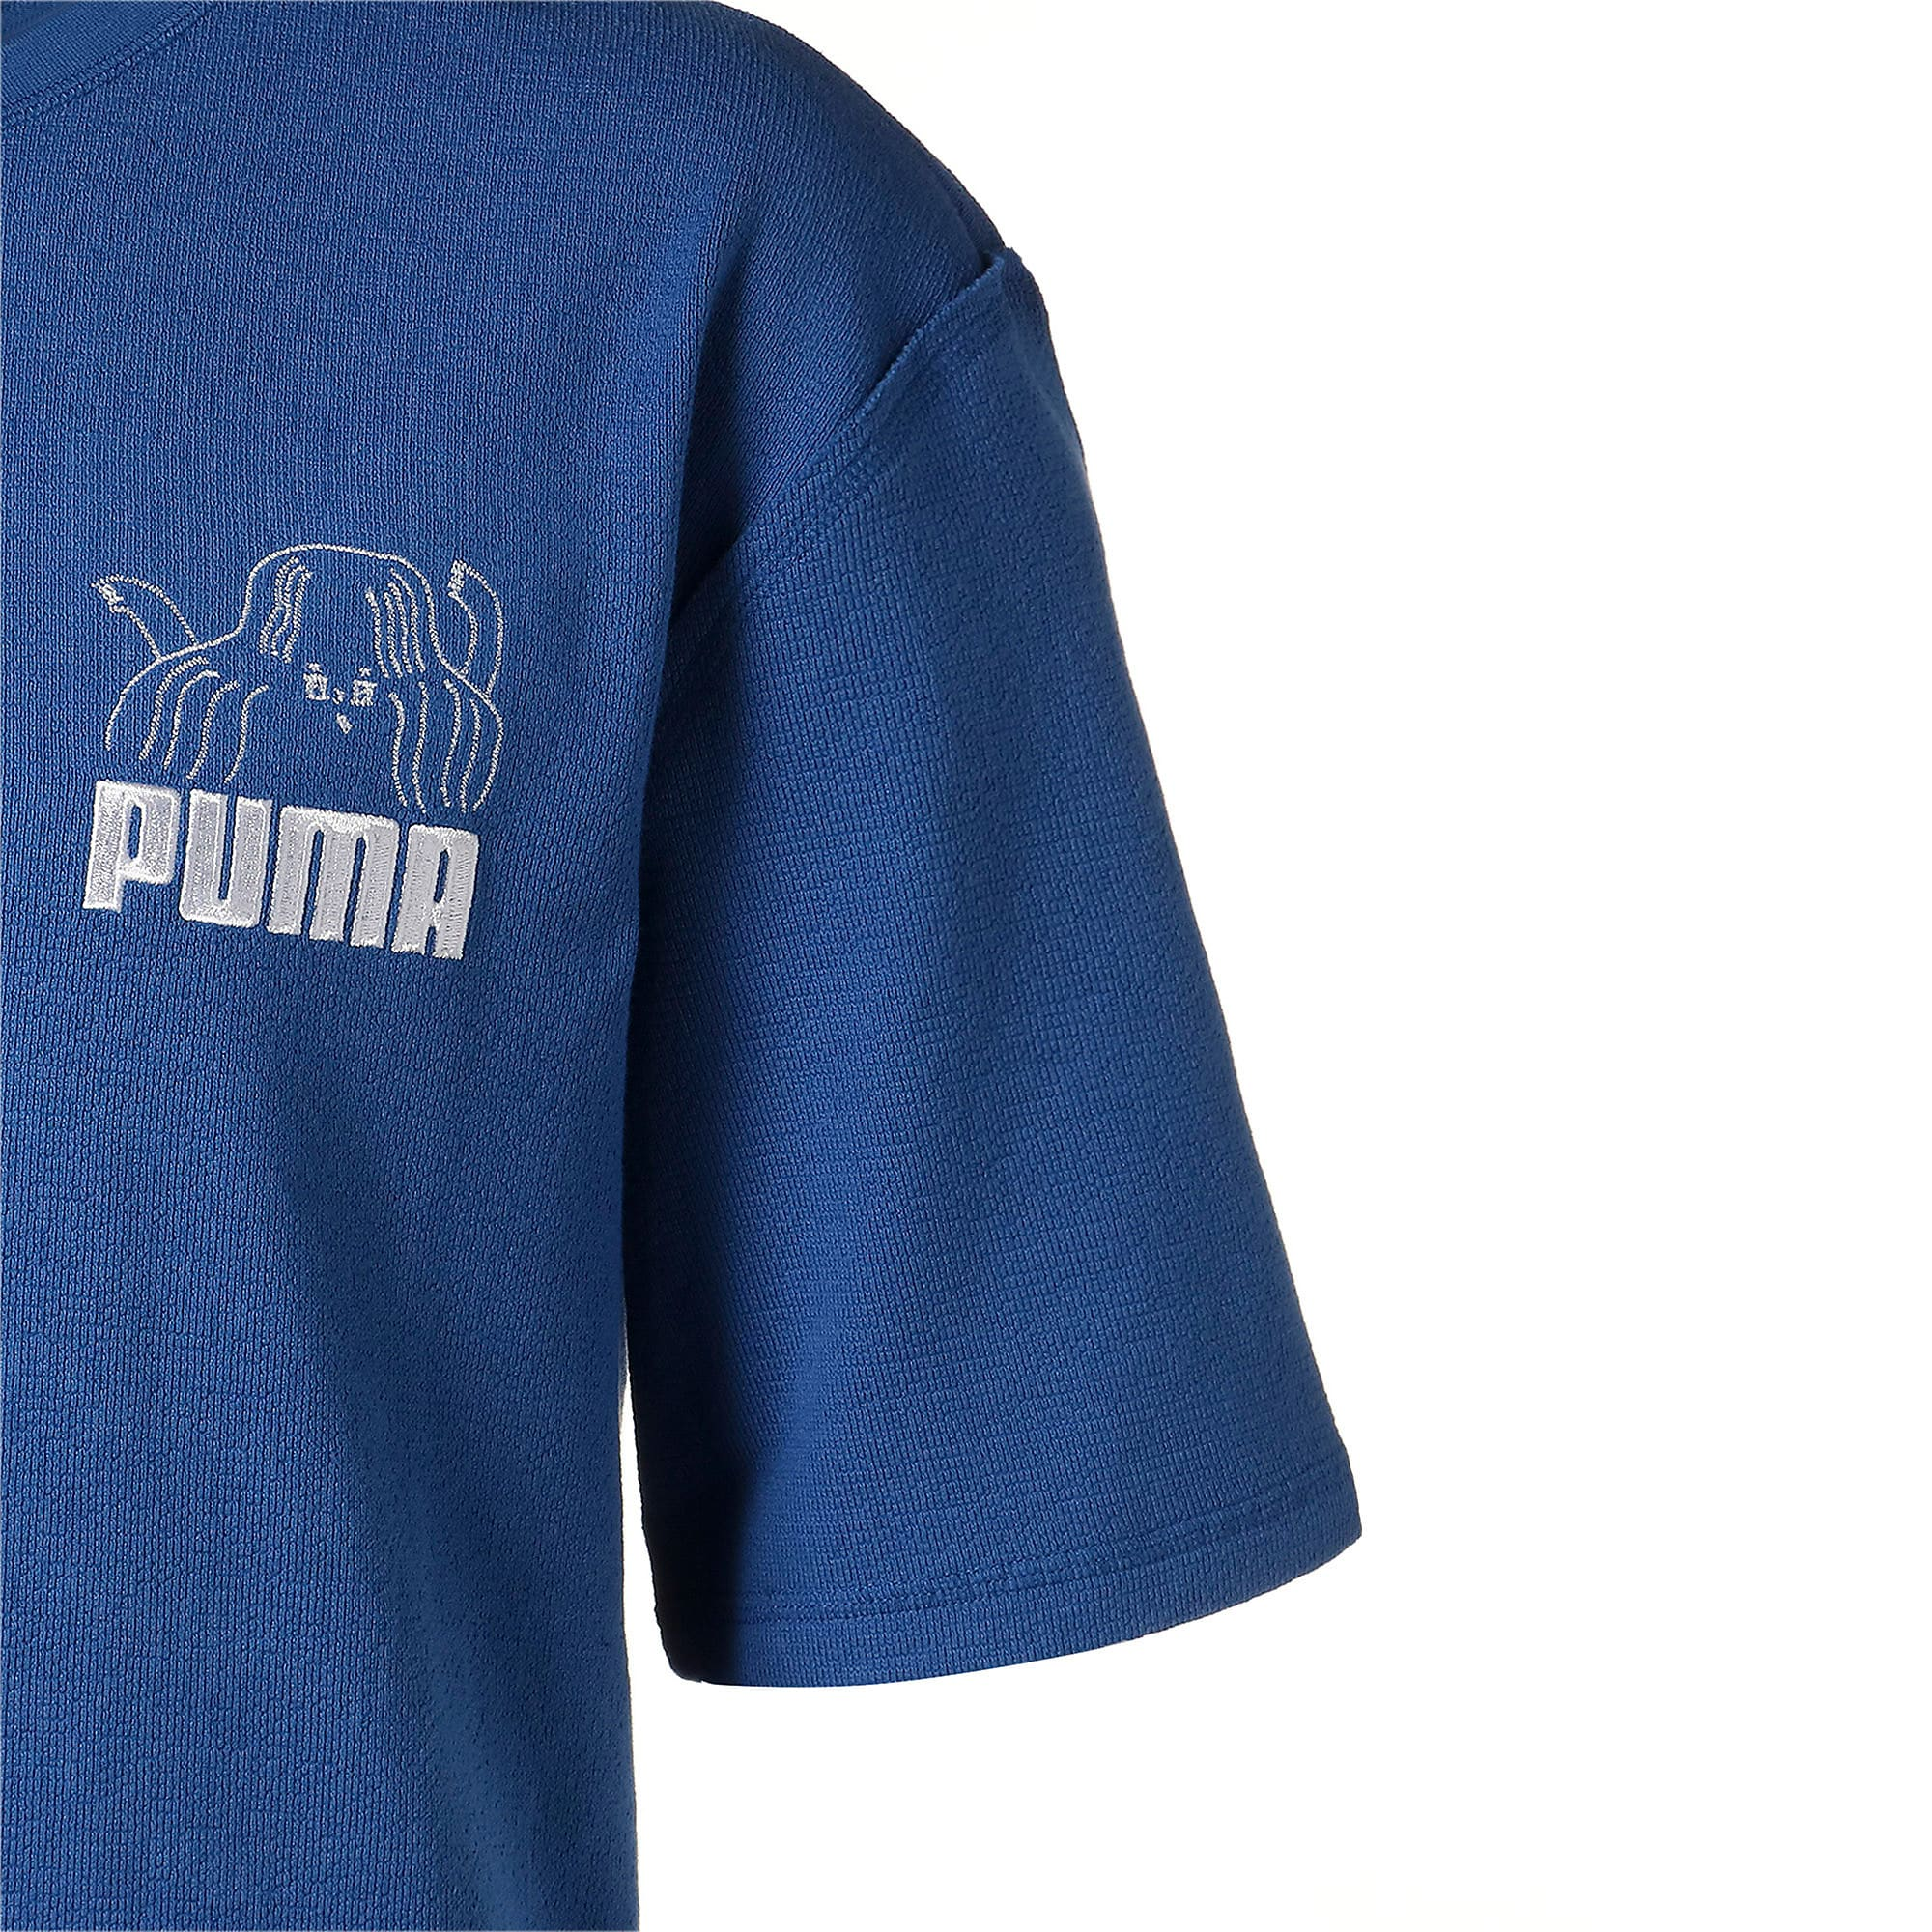 Thumbnail 5 of PUMA x TYAKASHA Tシャツ, Galaxy Blue, medium-JPN